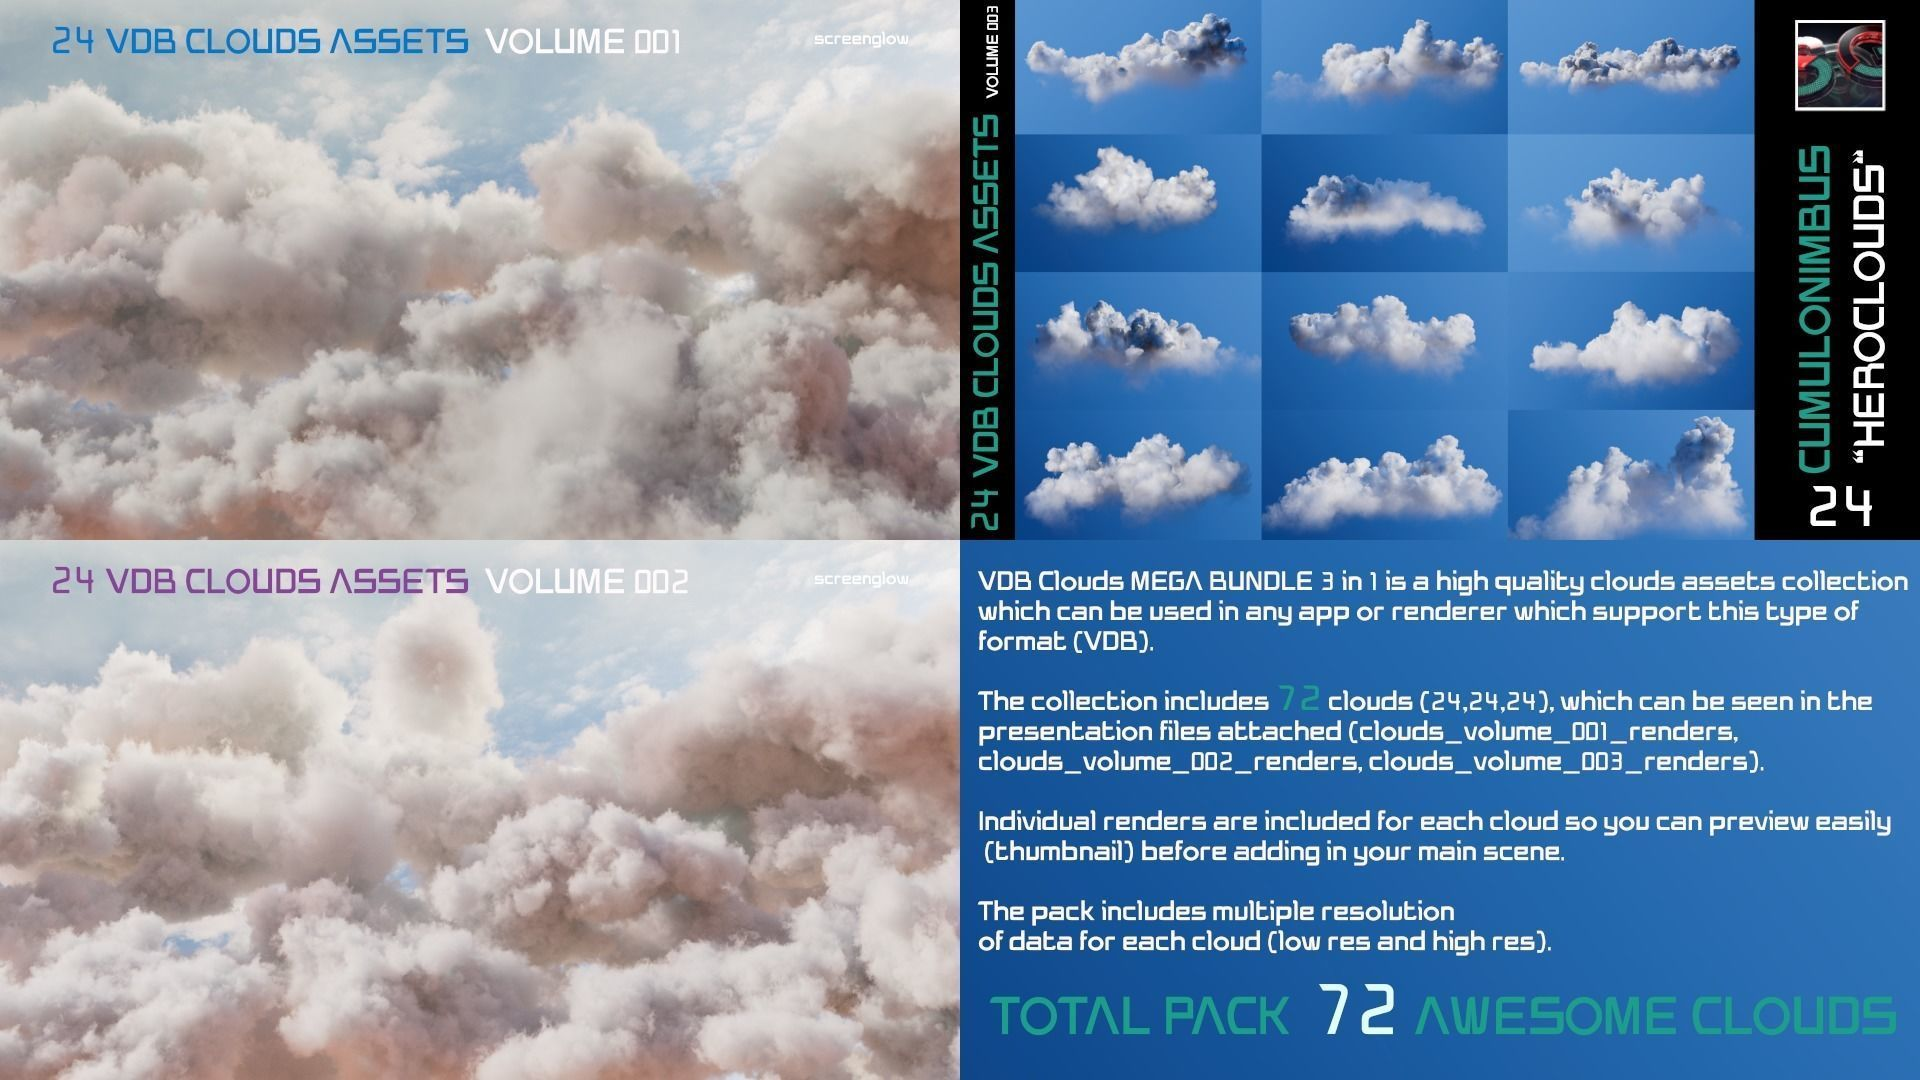 VDB Clouds MEGA BUNDLE 3 in 1